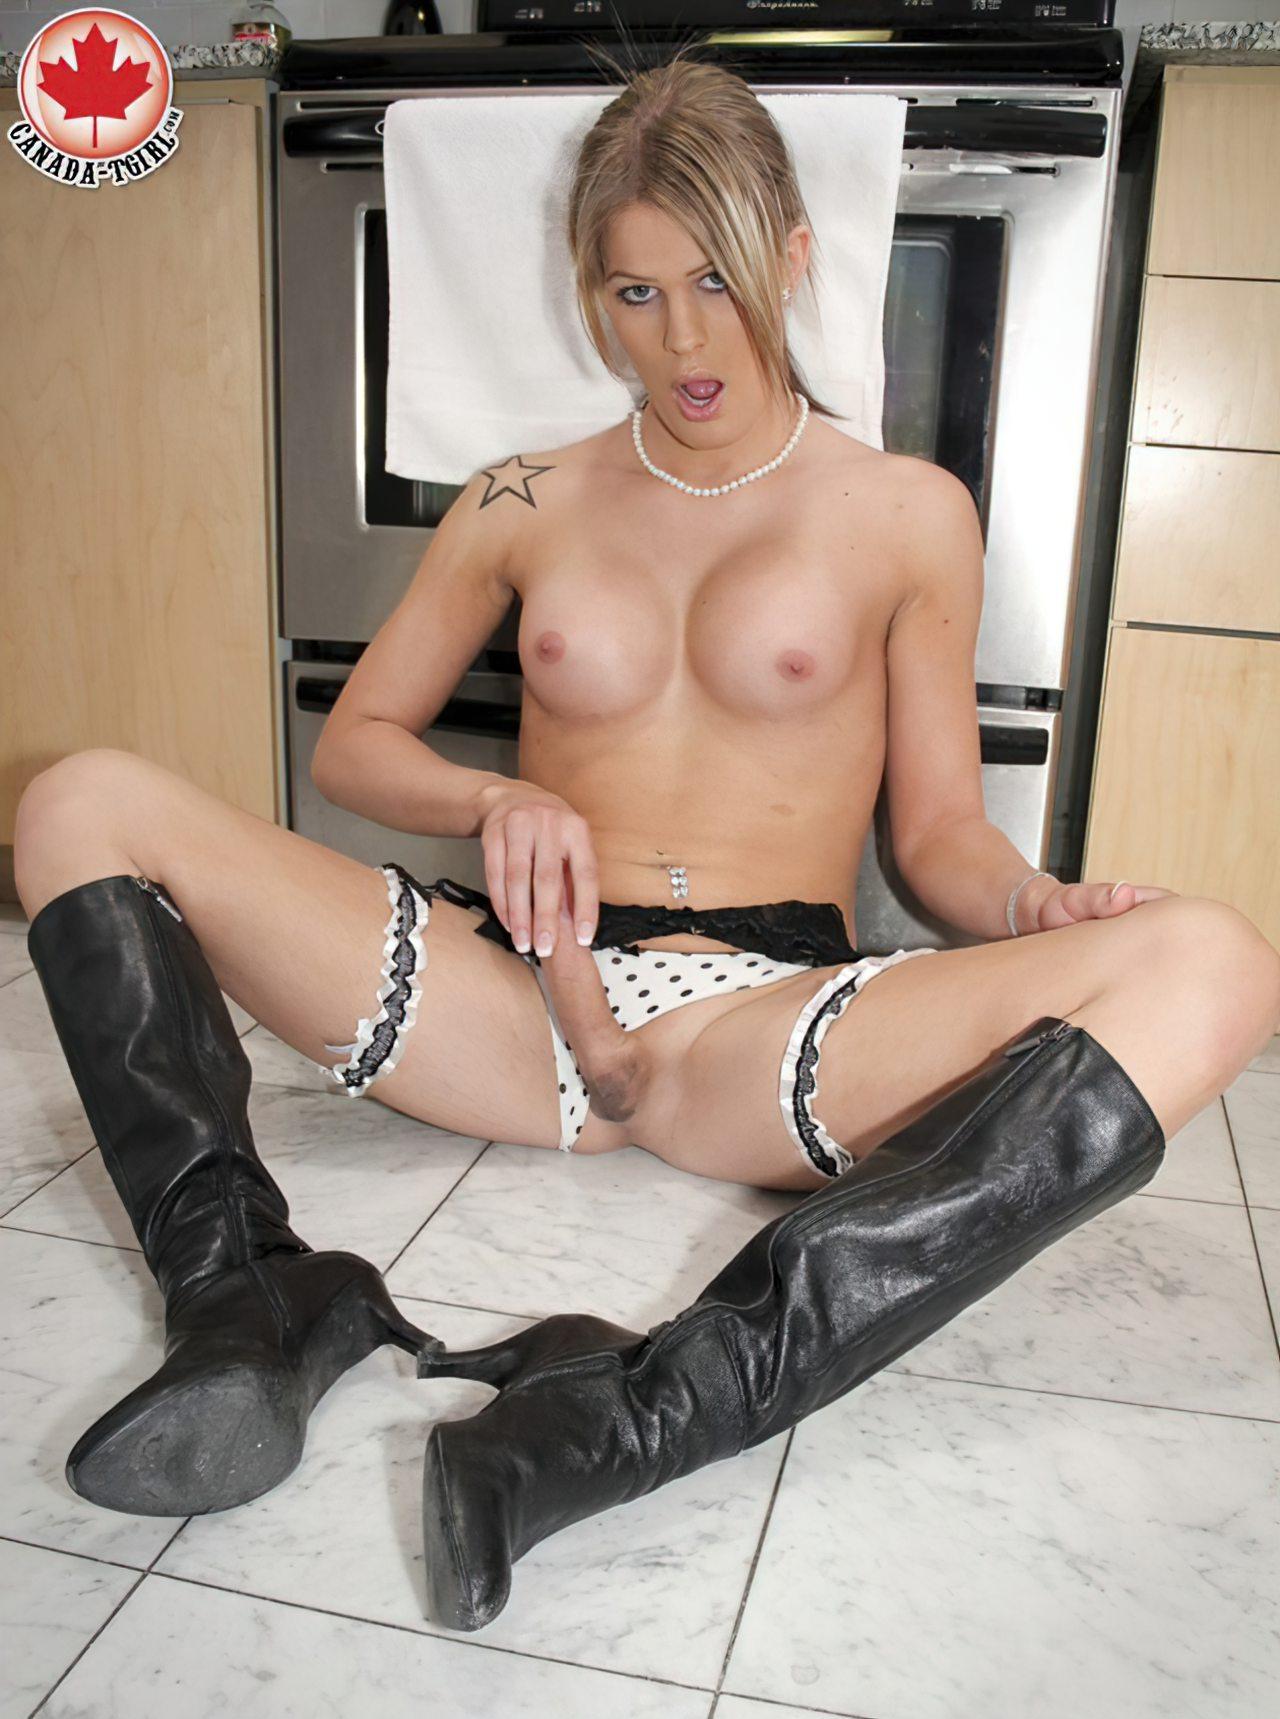 Esposa Transexual na Cozinha